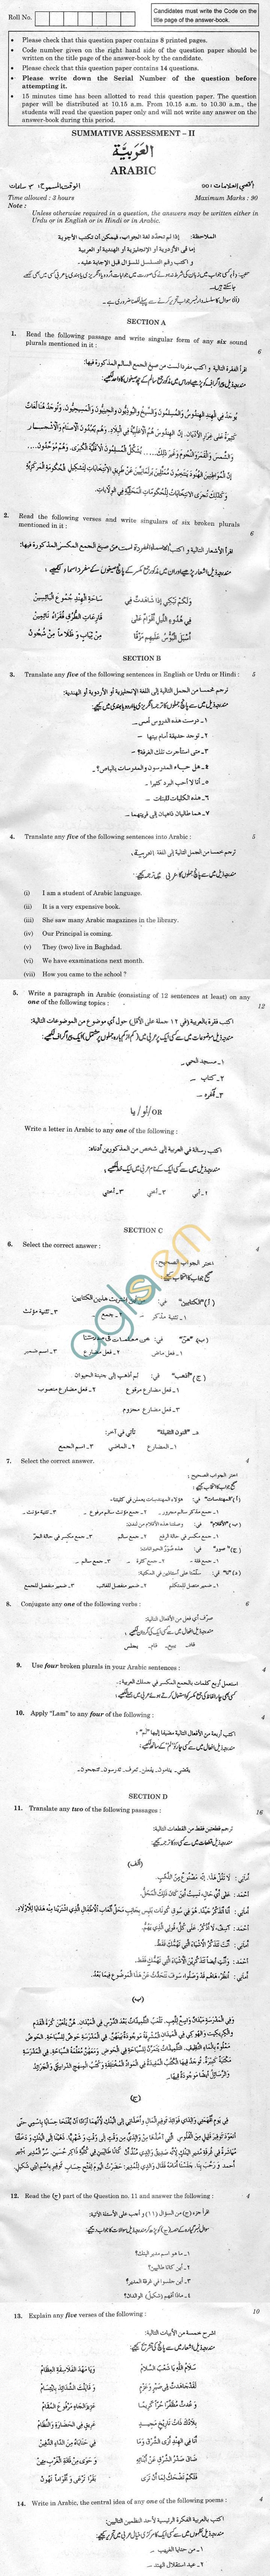 CBSE Compartment Exam 2013 Class X Question Paper -Arabic